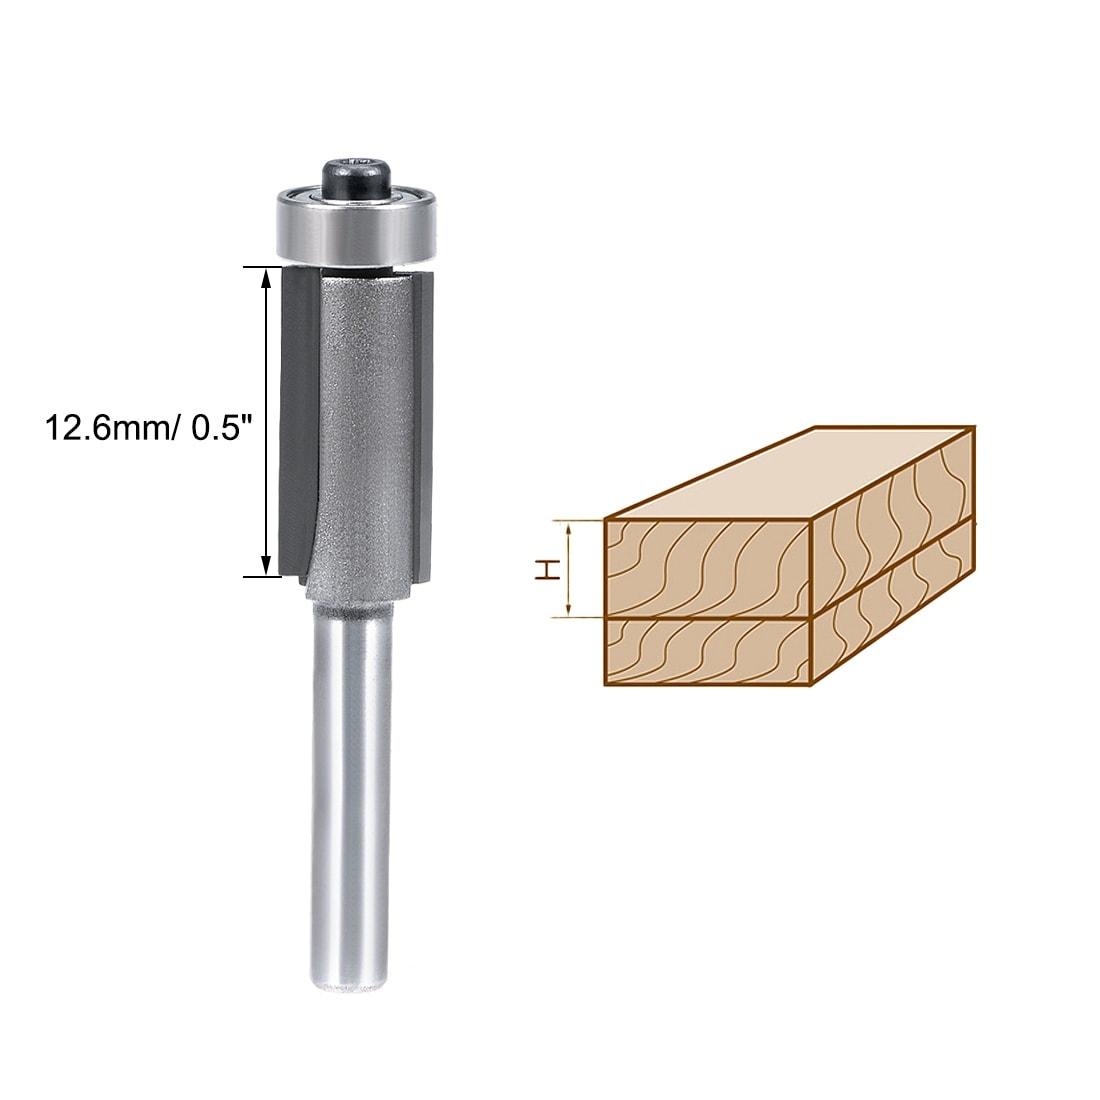 "Details about  /Router Bit 1//2 Shank 1//4/"" Cut Dia 25mm Depth Flush Trim Bit Bearing HSS Milling"